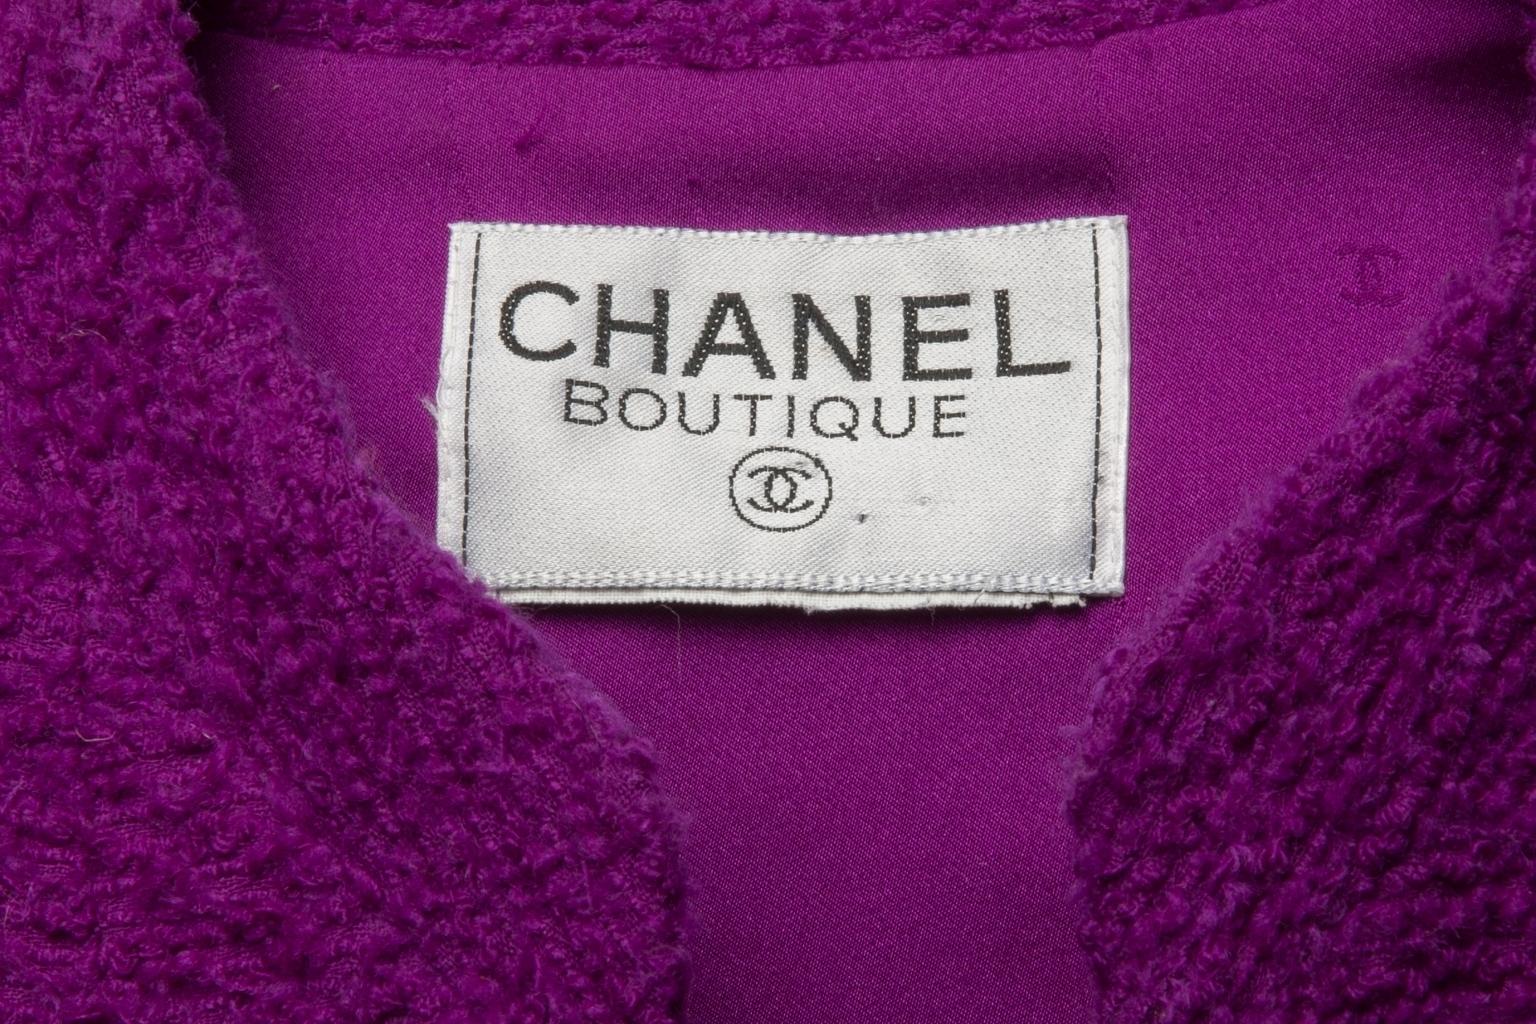 Элегантный костюм из твида от Chanel, 42 размер.